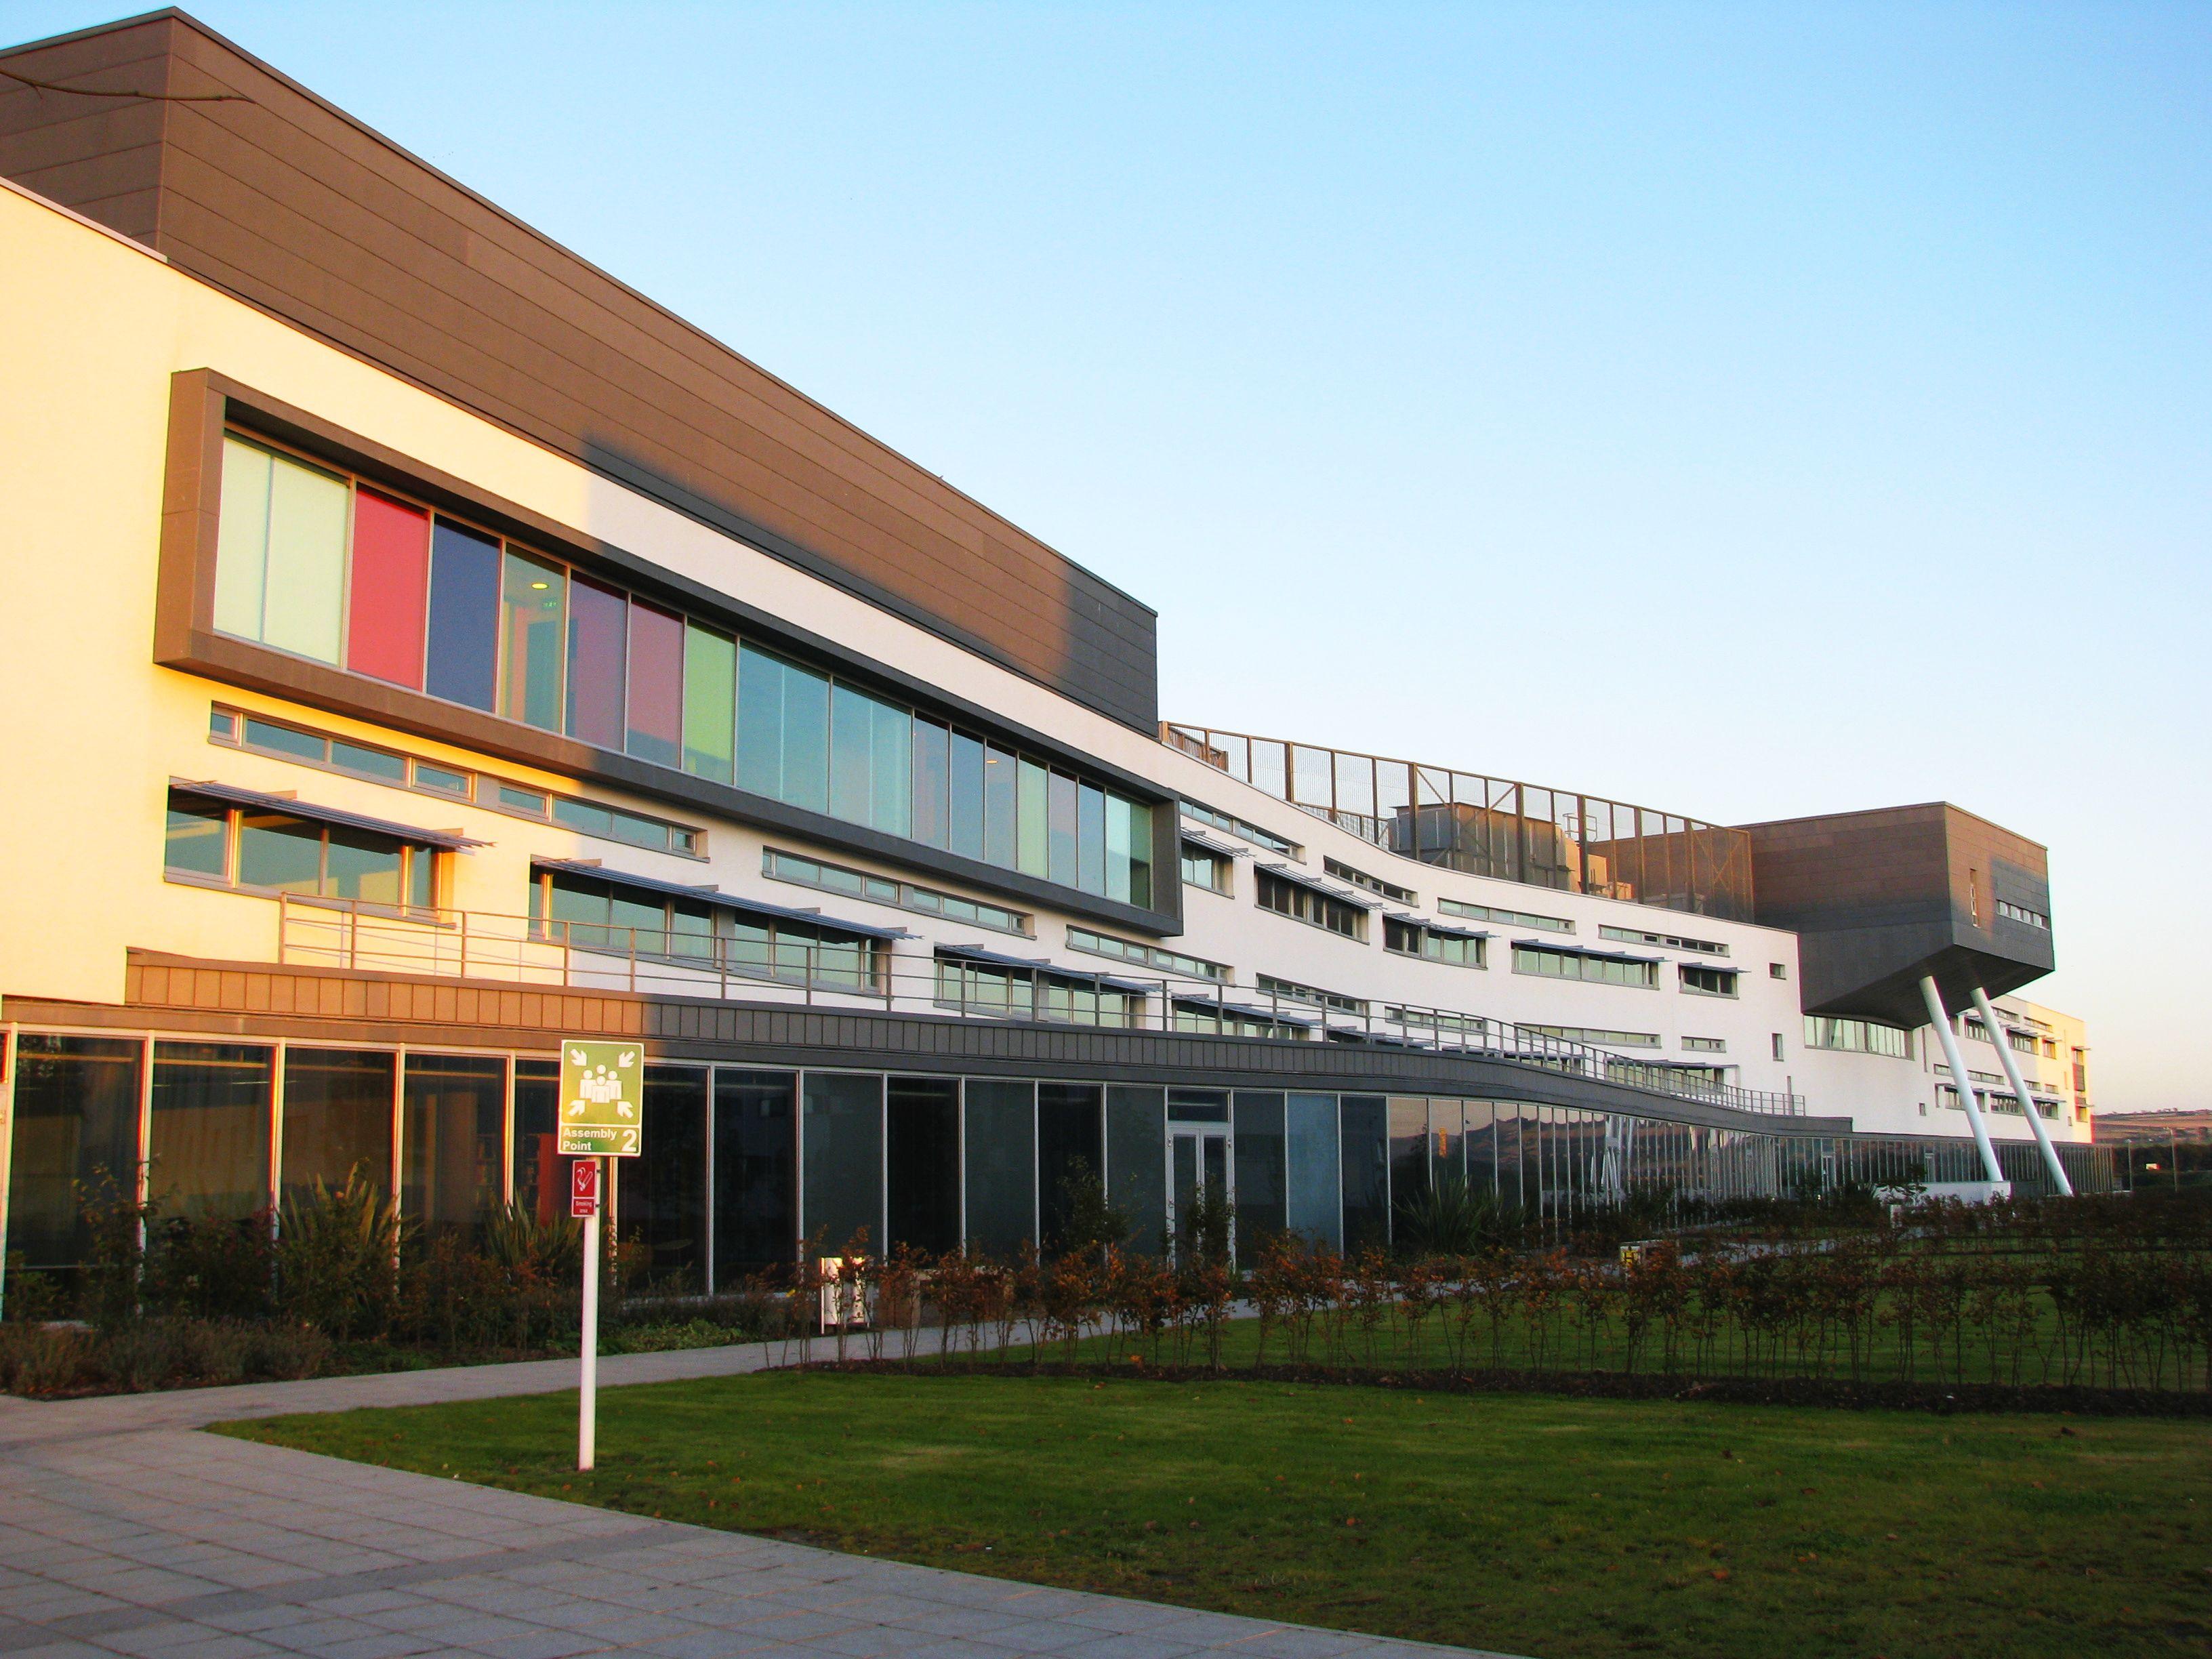 Queen_Margaret_University_main_buildingm